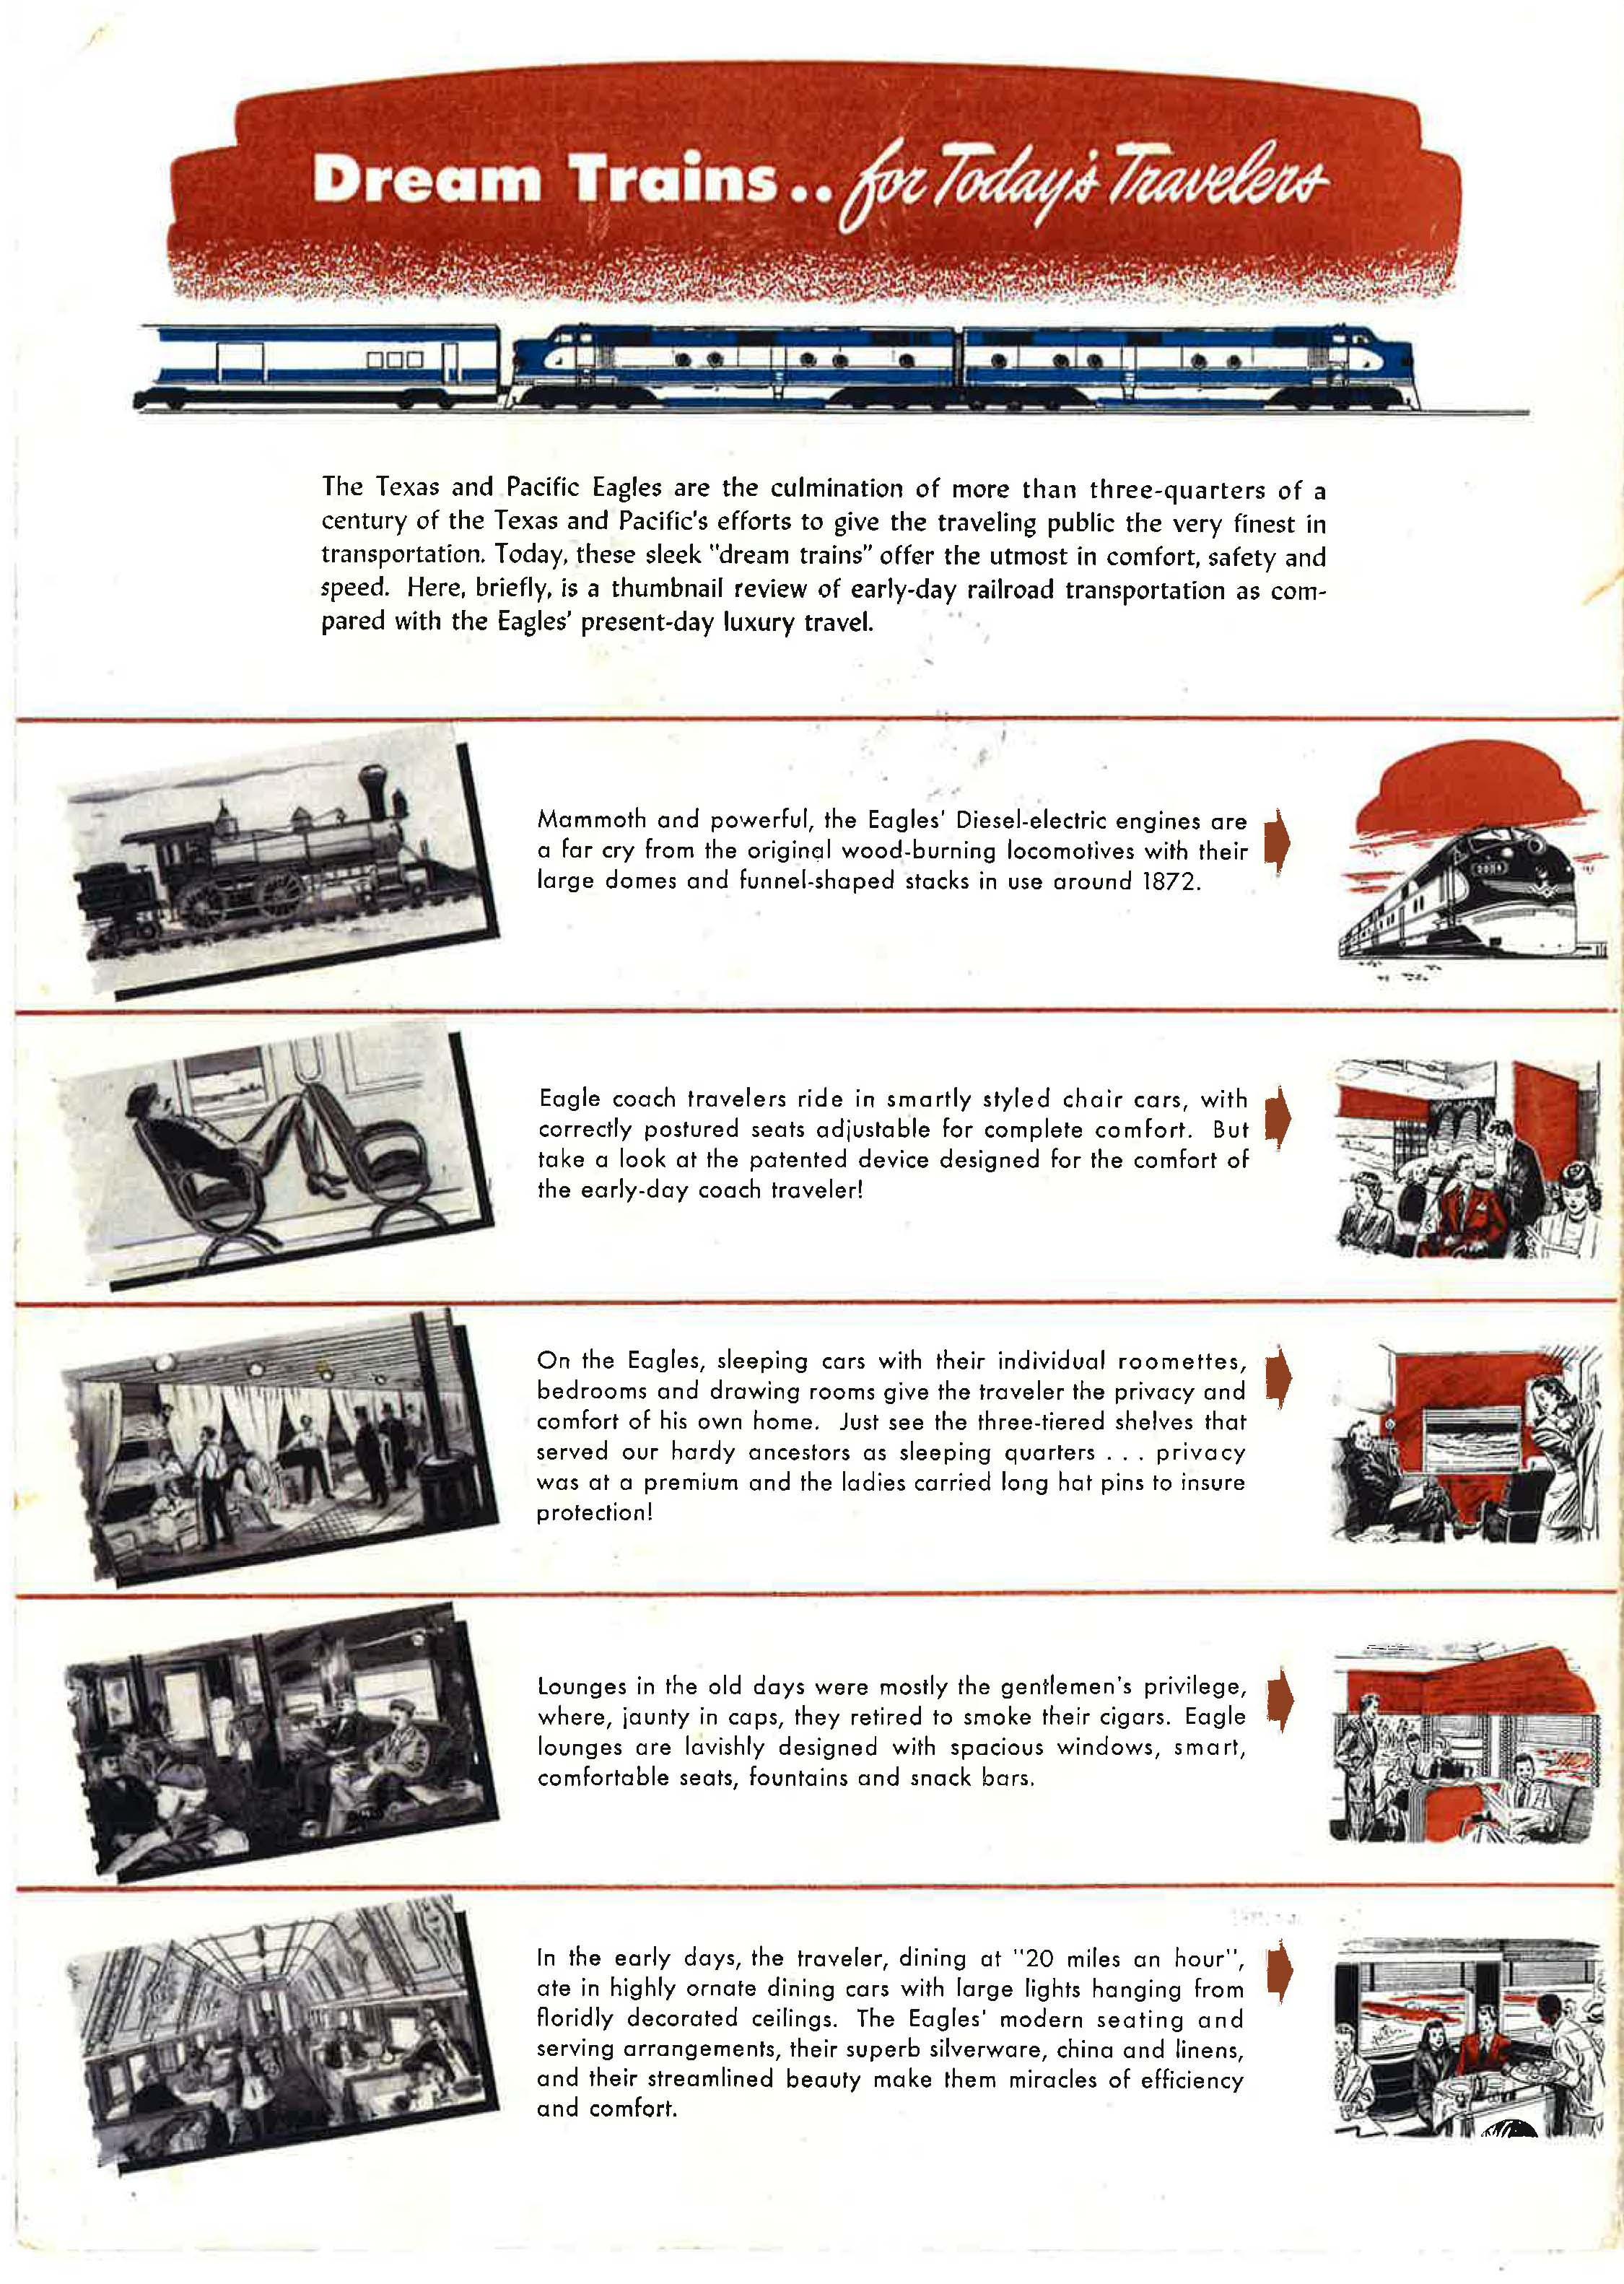 Texas+And+Pacific+Railway+the+Eagles+Breakfast+Menu 3.jpg